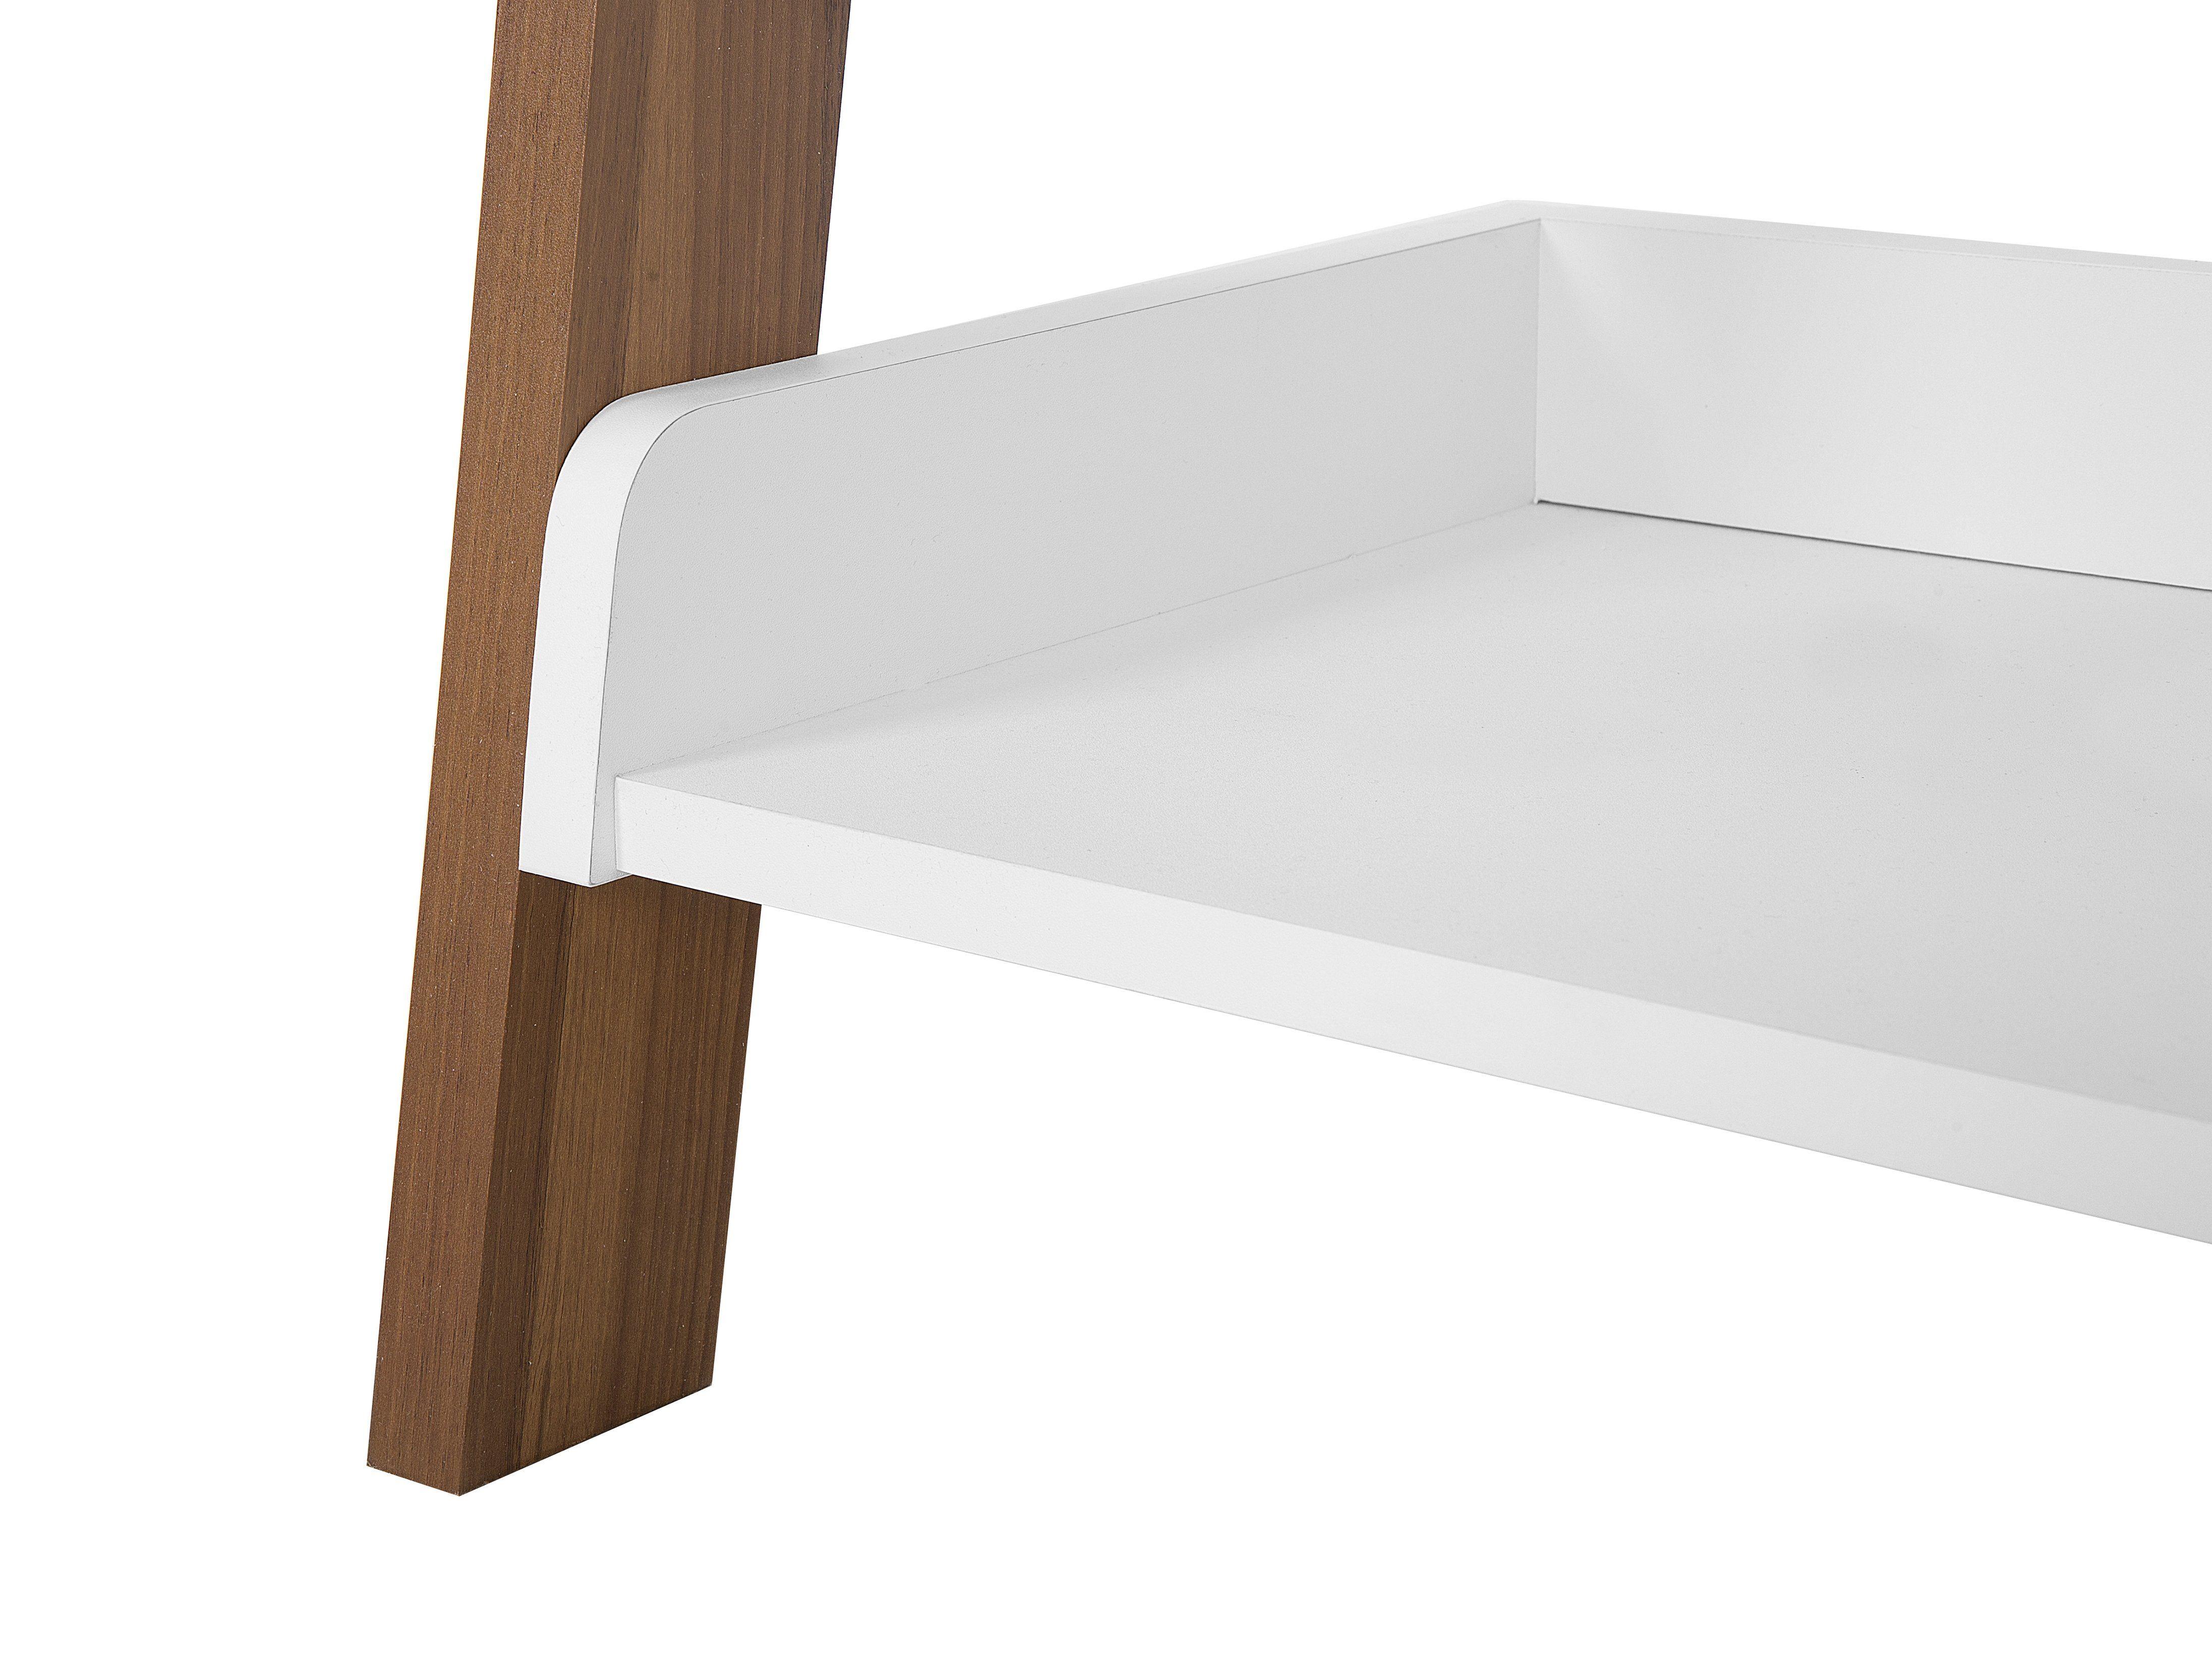 Photo of MOBILE TRIO bookshelf brown and white